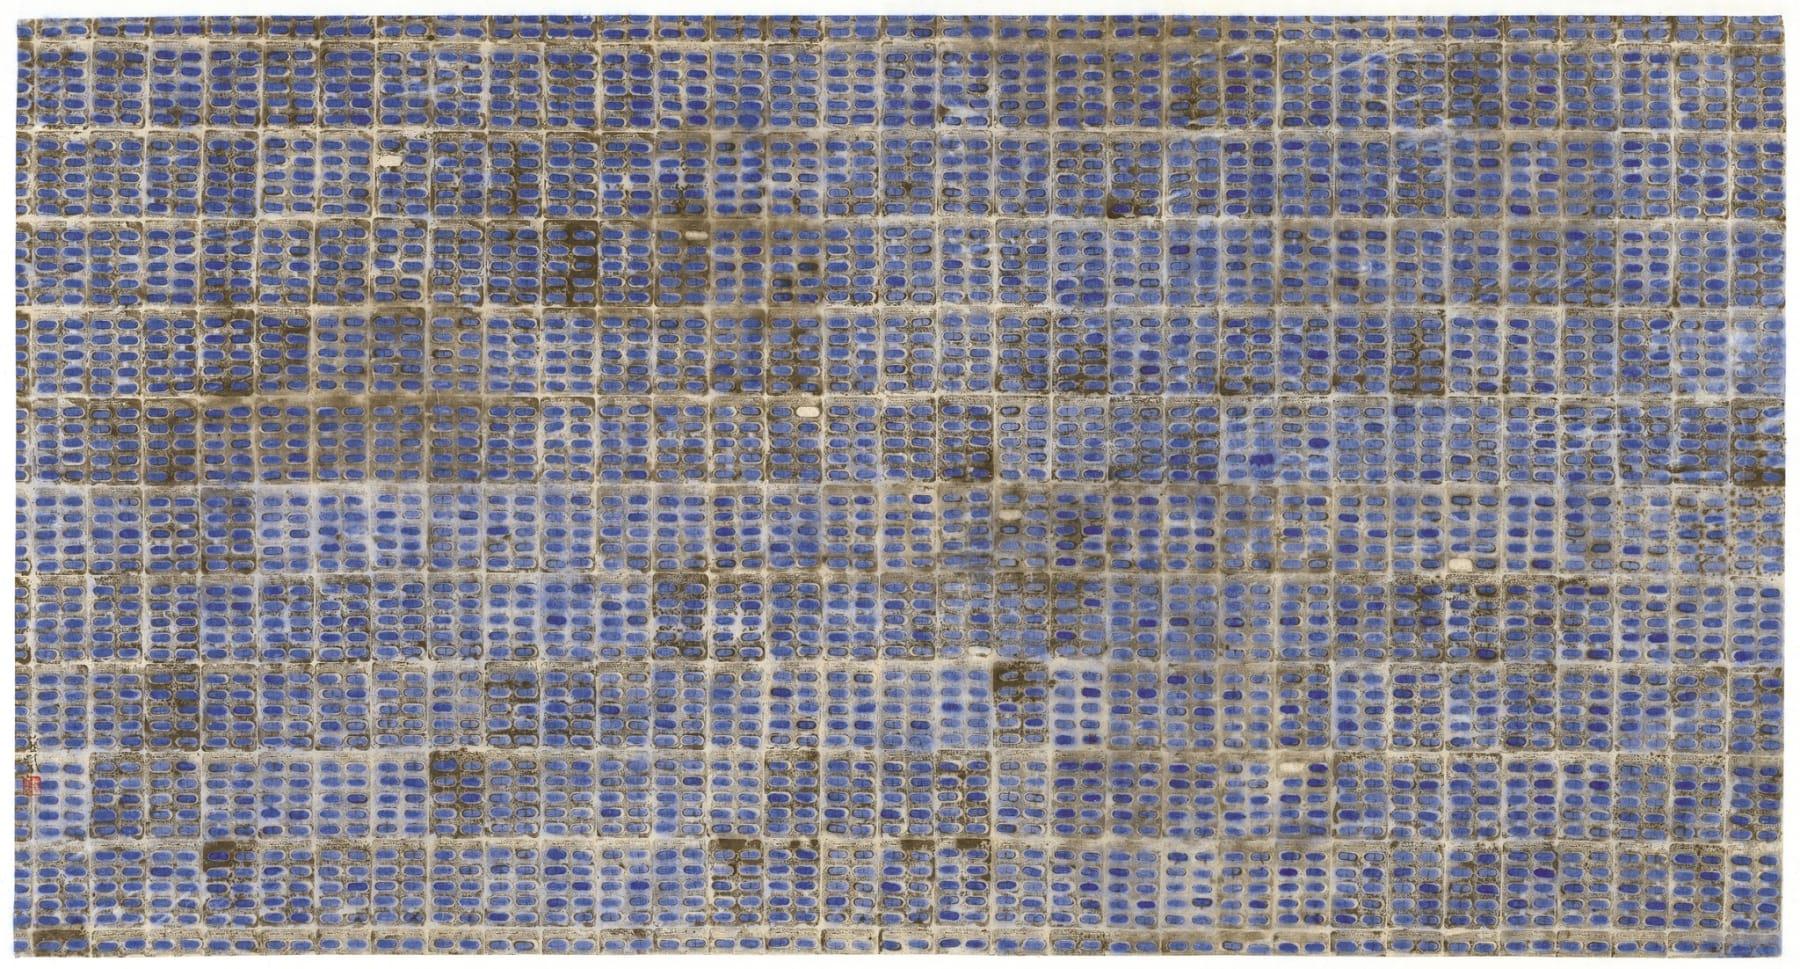 Zhang Yanzi 章燕紫, Medi-Chip 2 空芯片 2, 2016